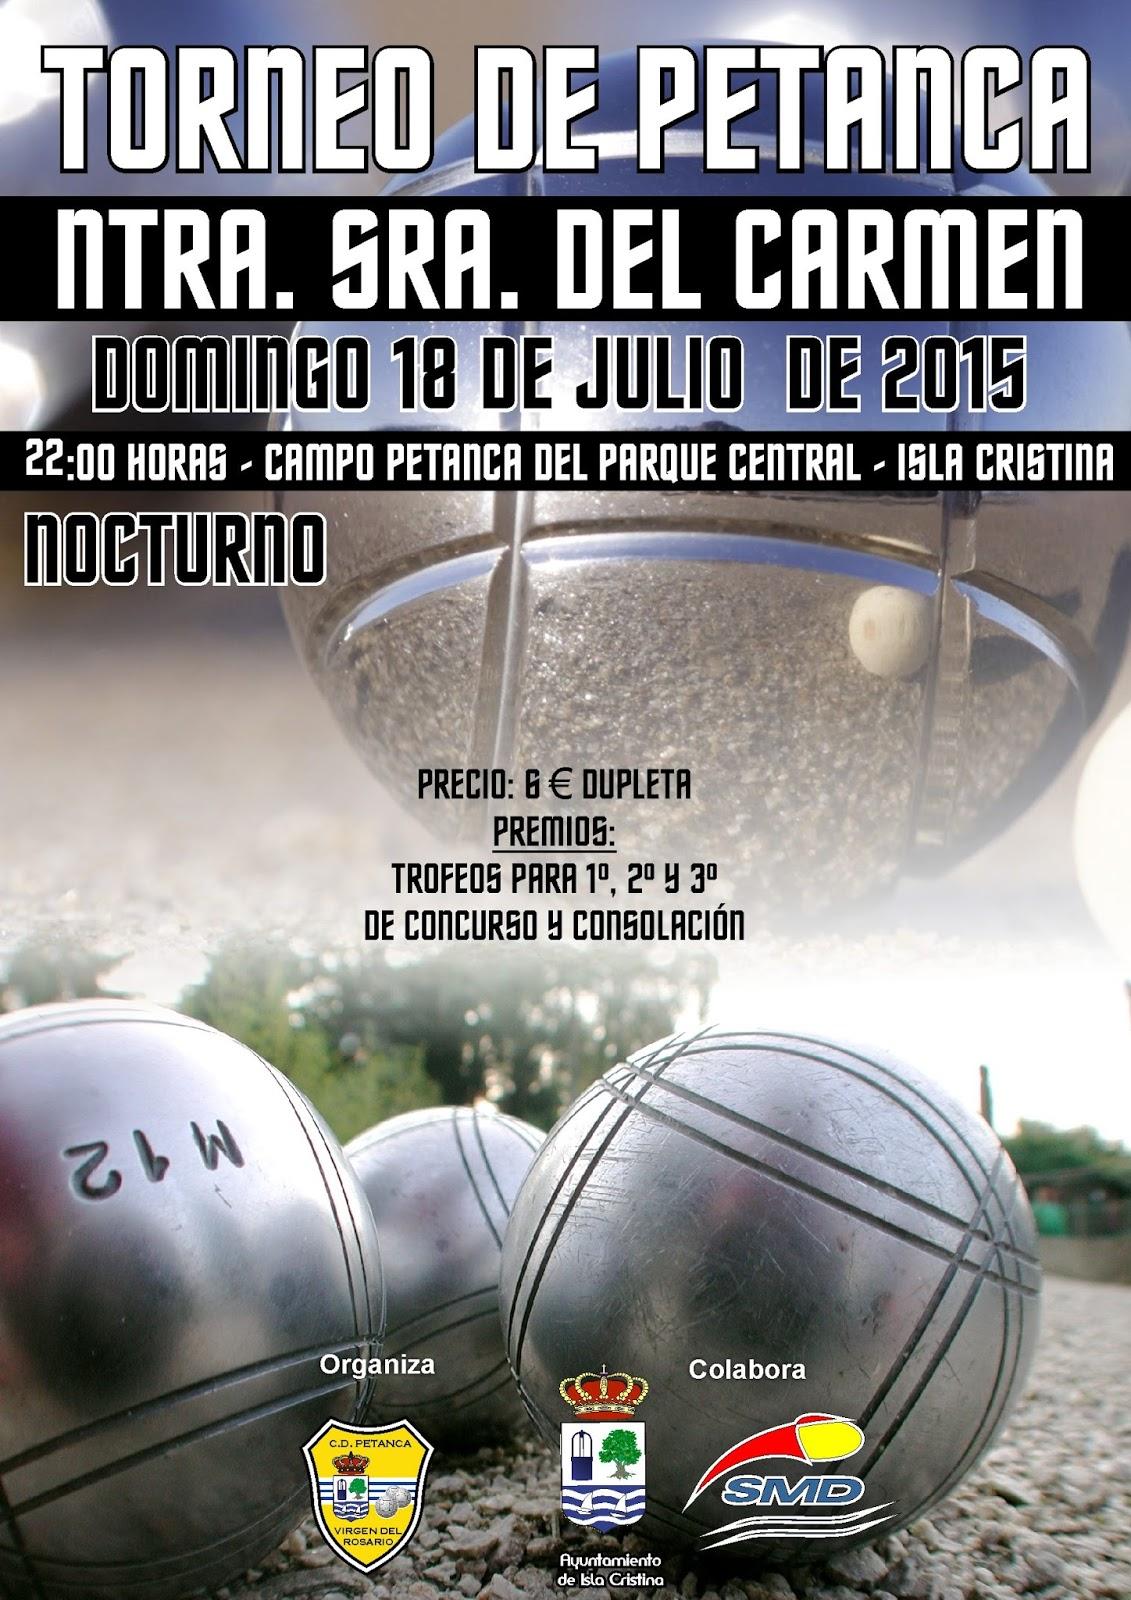 Isla Cristina Alberga el Torneo Nocturno de Petanca Virgen del Carmen